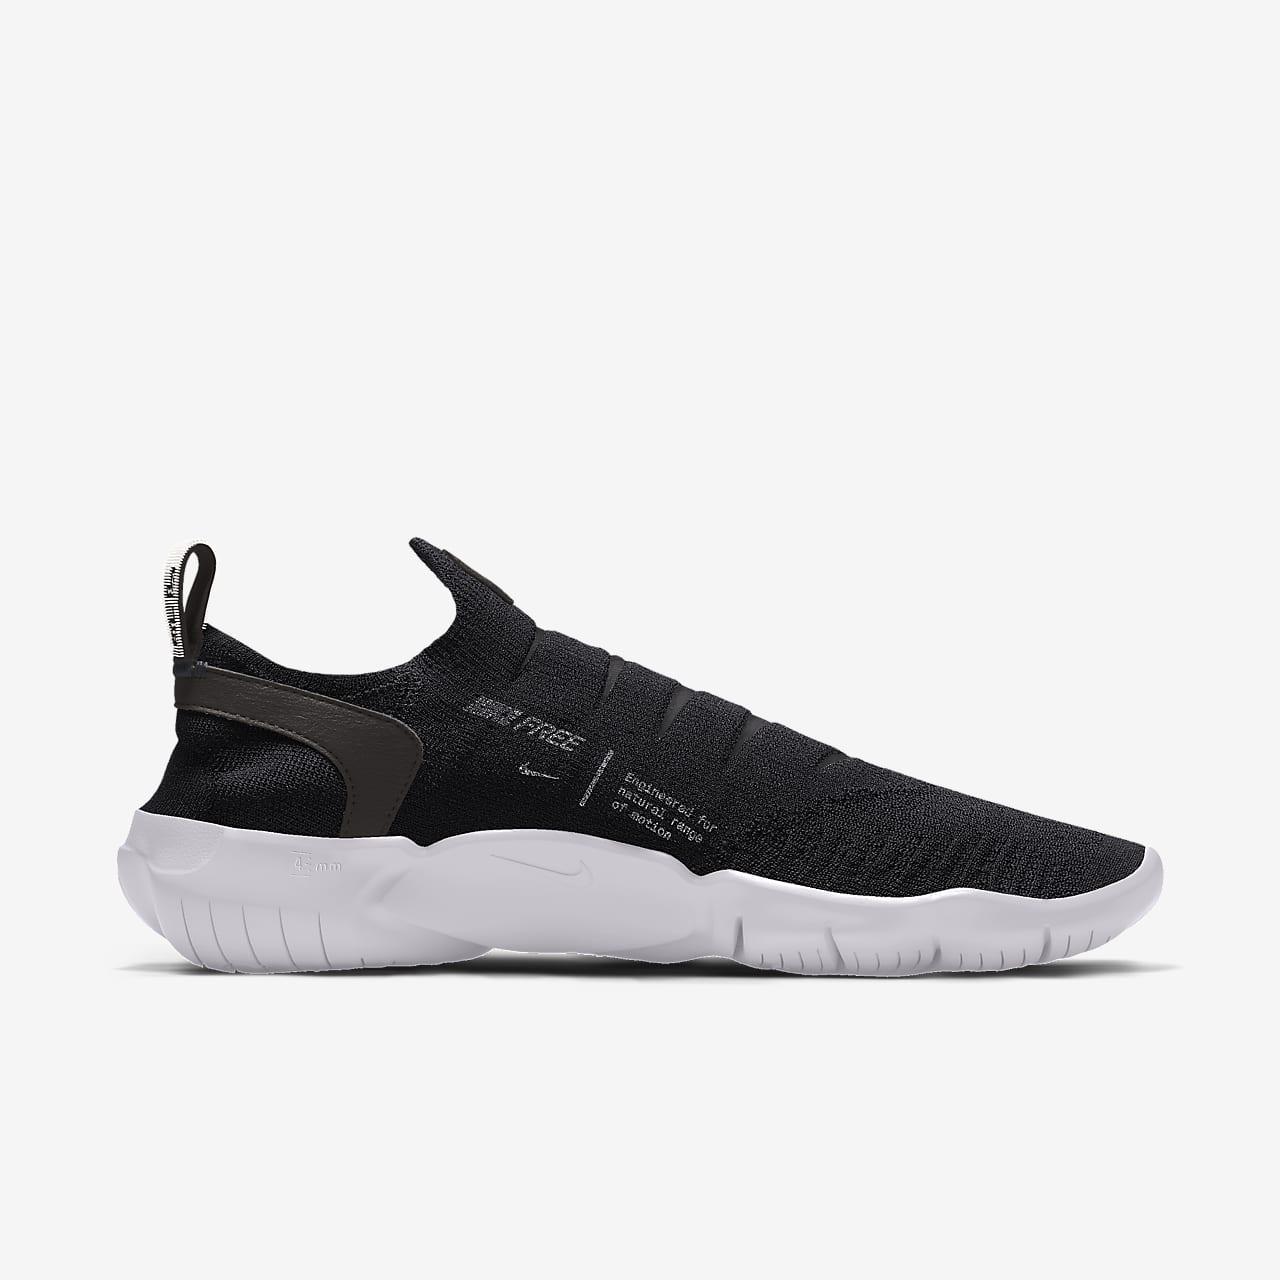 Nike Free RN Flyknit 3.0 By You Custom Men's Running Shoe